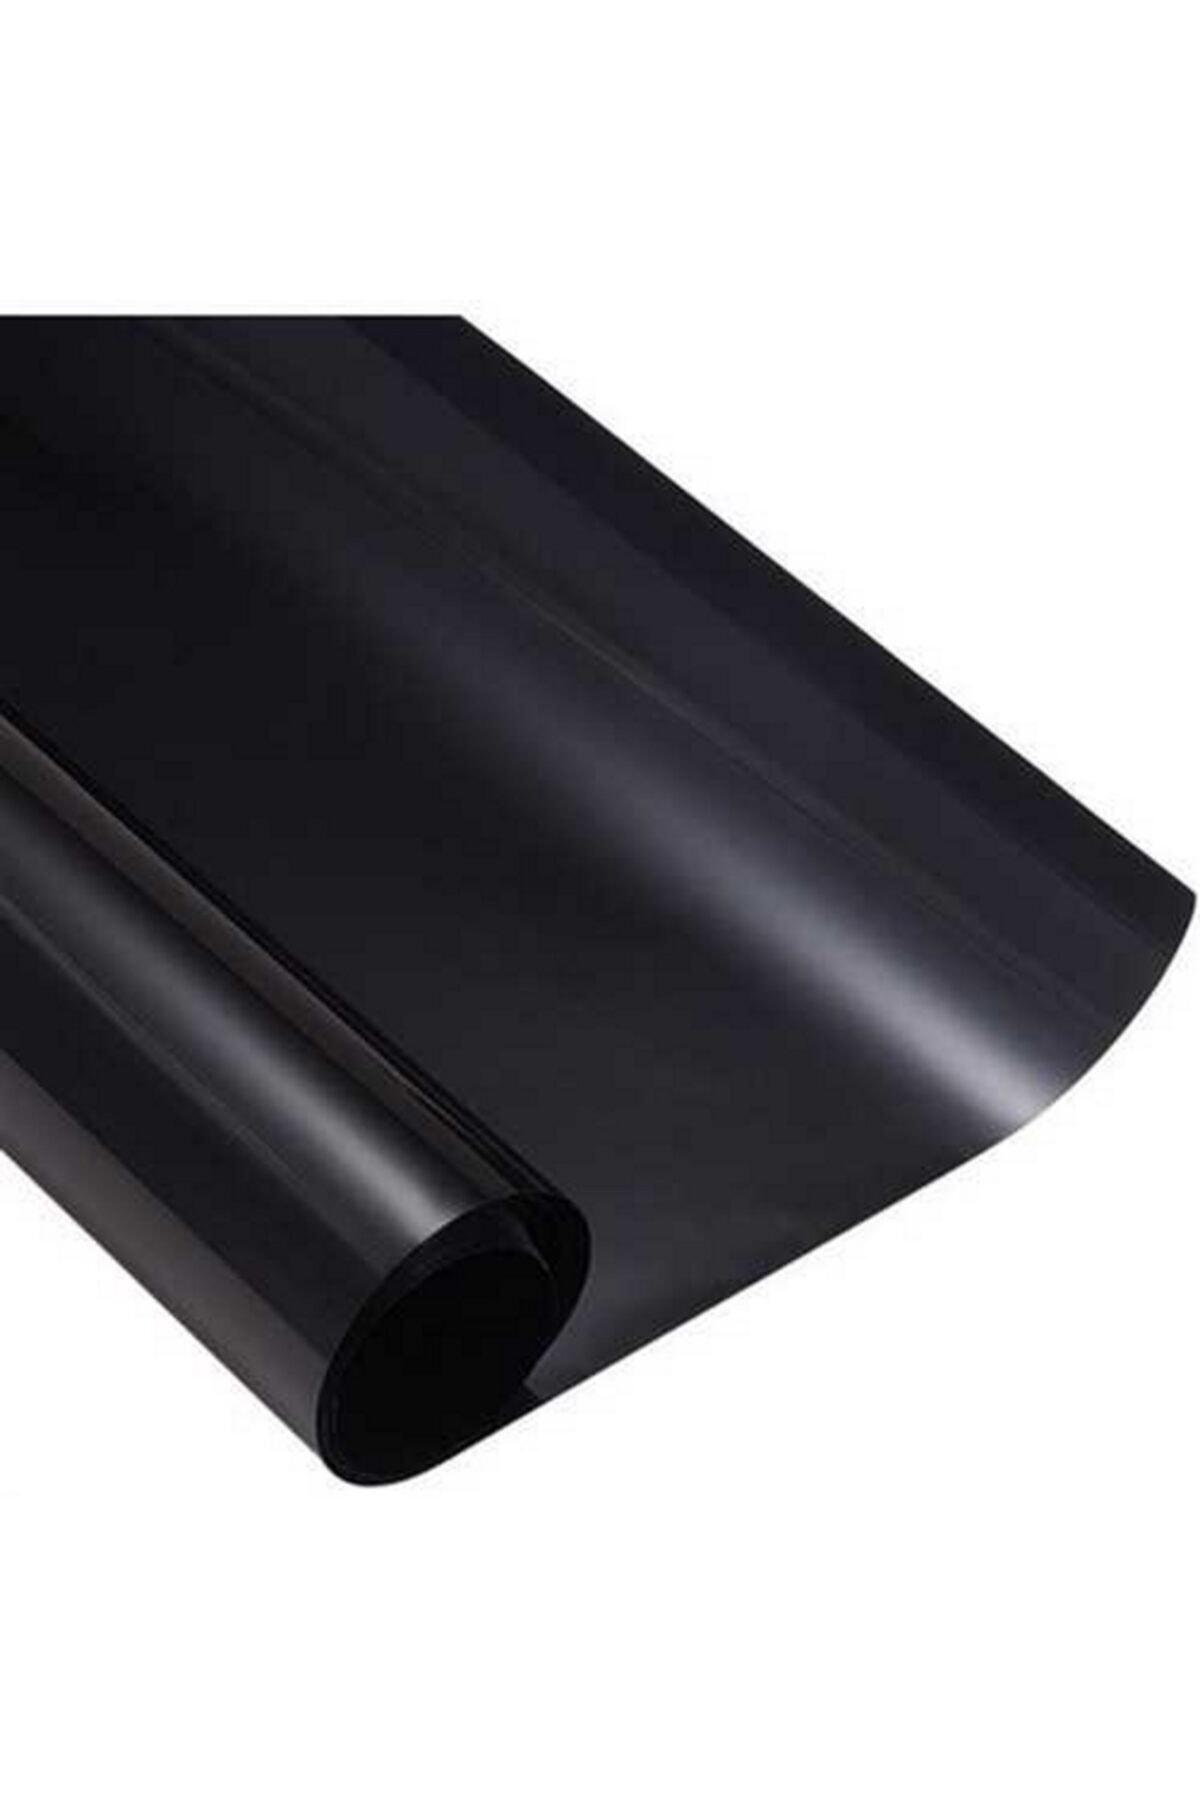 Oscar Tp Cam Filmi 6mt X 50cm Çizilmez D.black %15 2